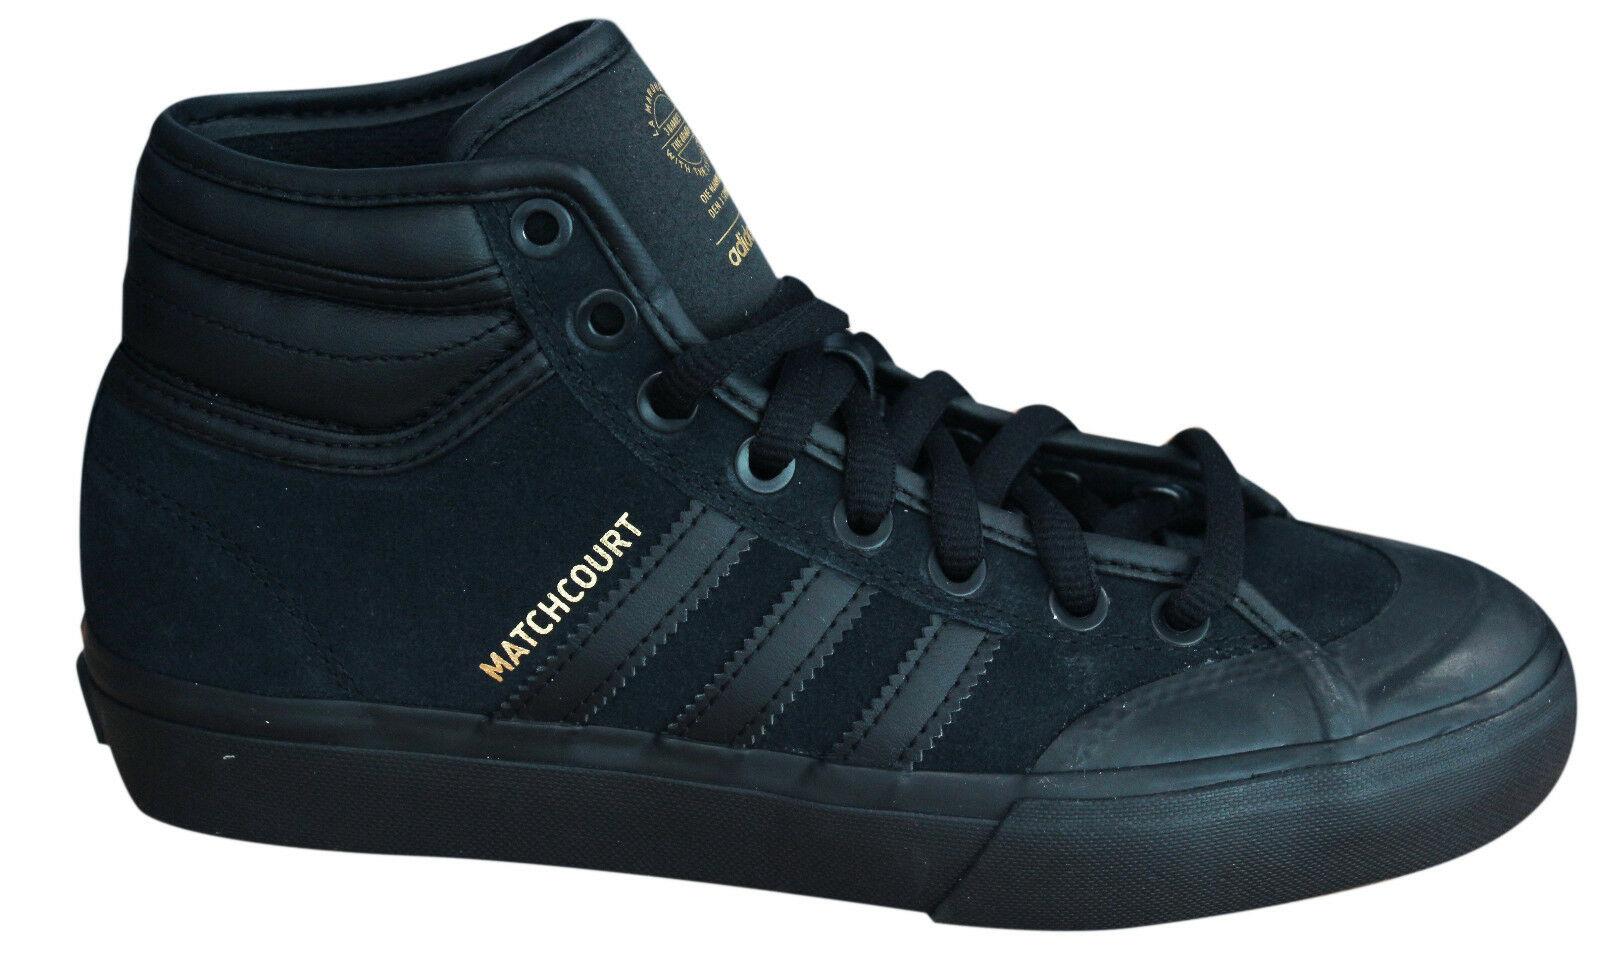 Adidas Originals Matchcourt High RX2